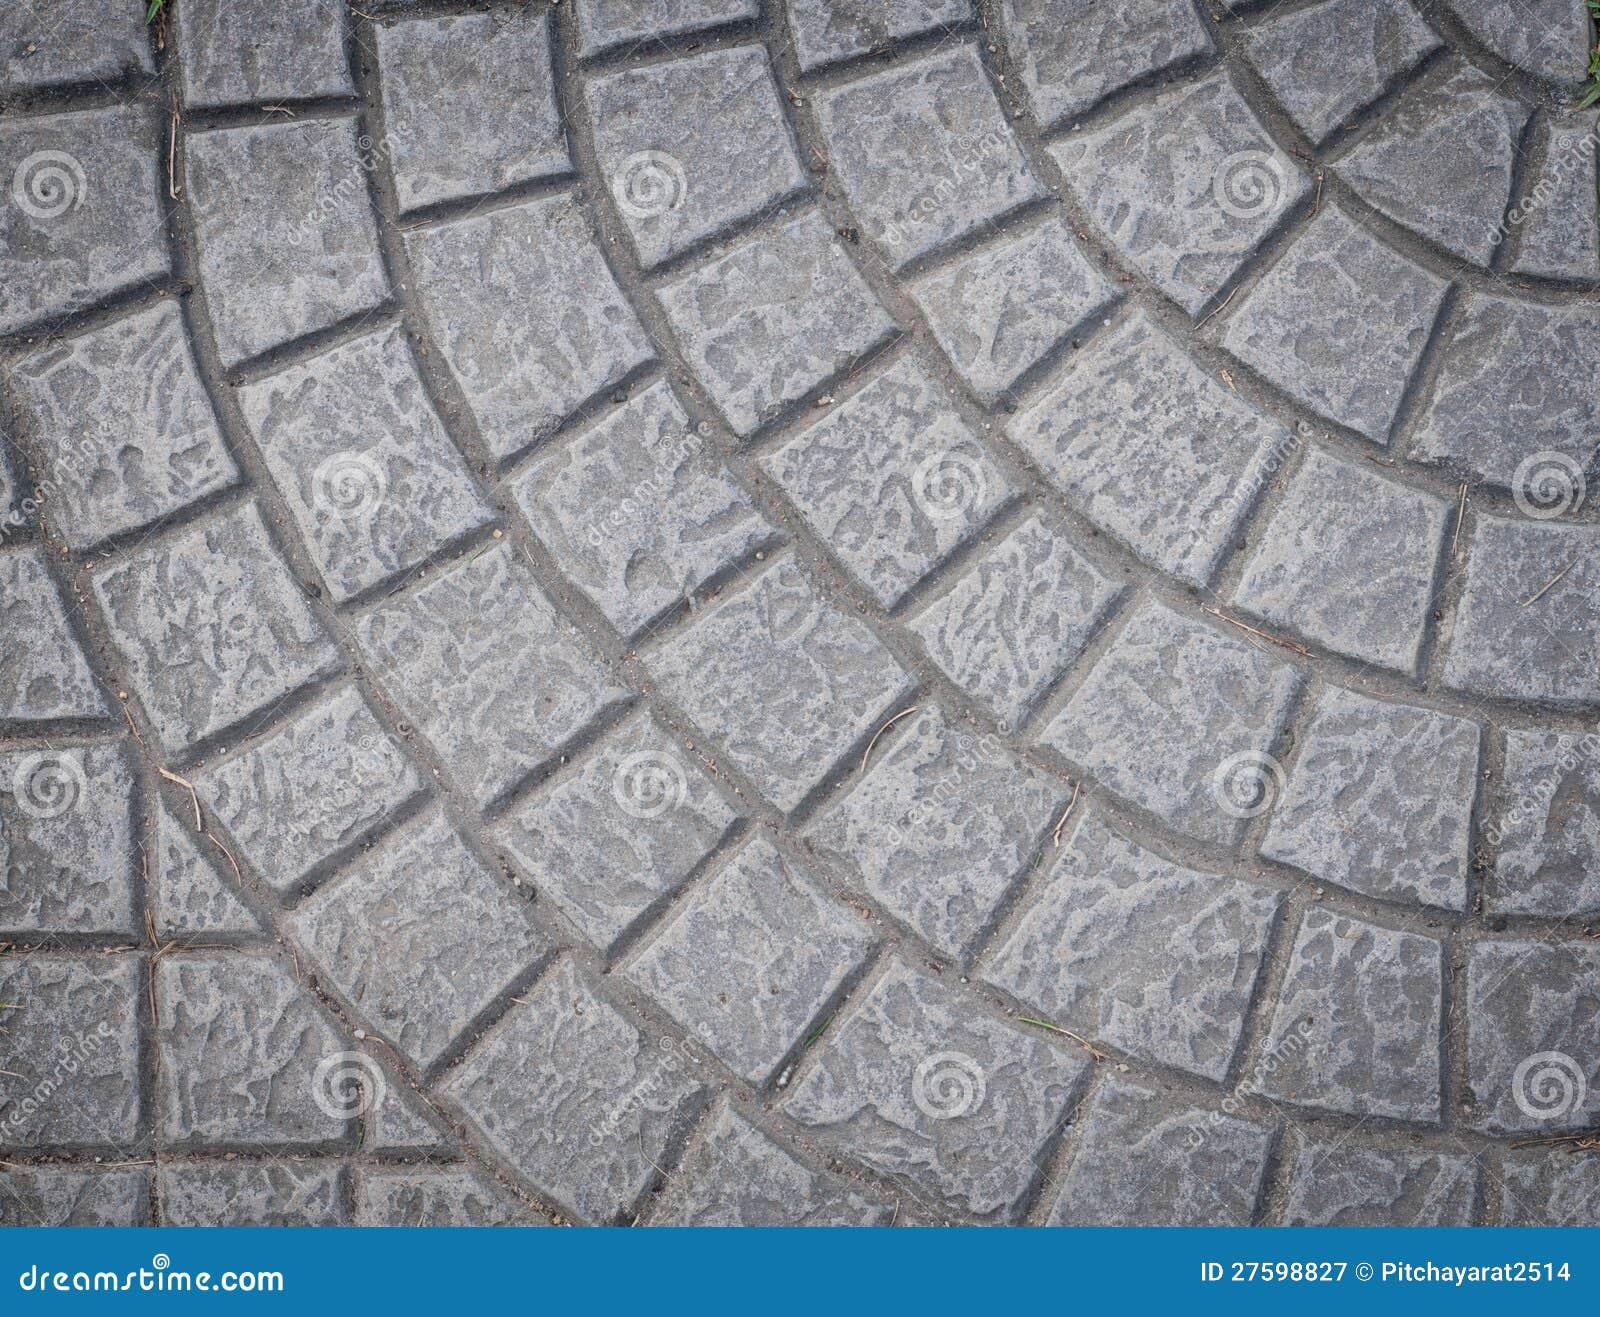 httpthumbsdreamstimecomzbackground stone floor texture